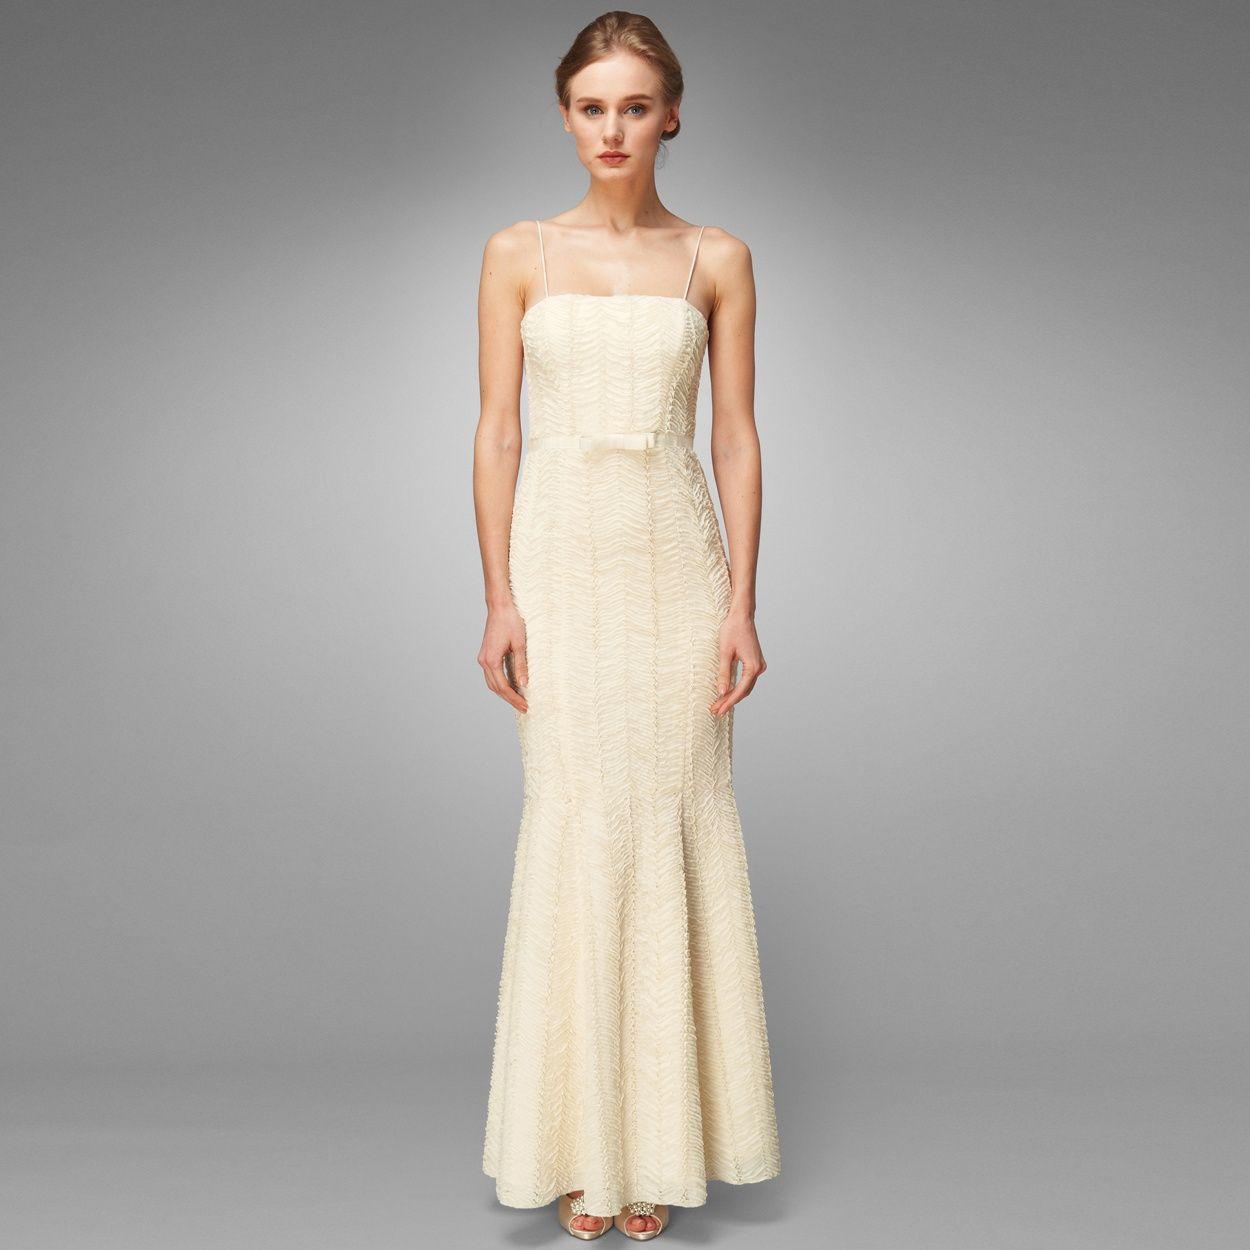 395 Phase Eight Pearl katherine wedding dress at Debenhams ...